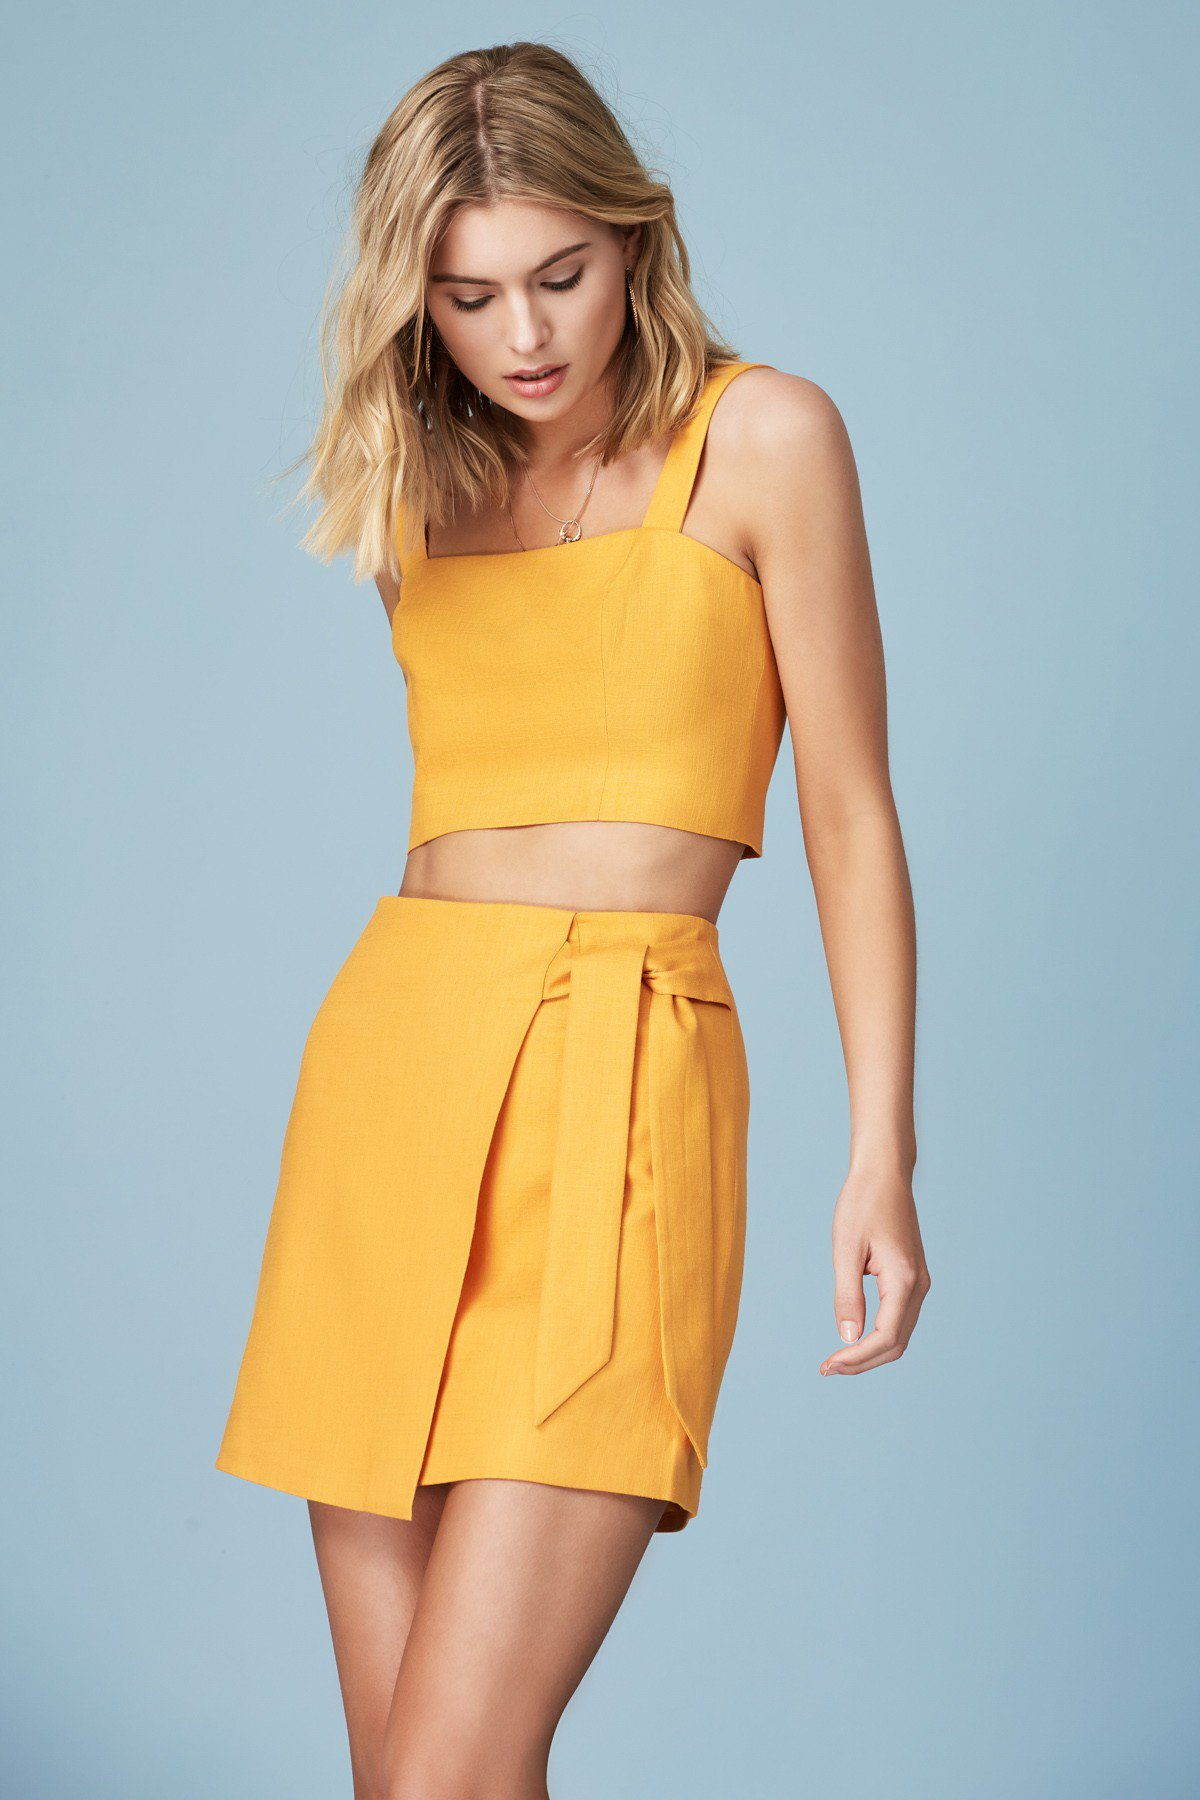 Finders Keepers Instinct Top + Skirt